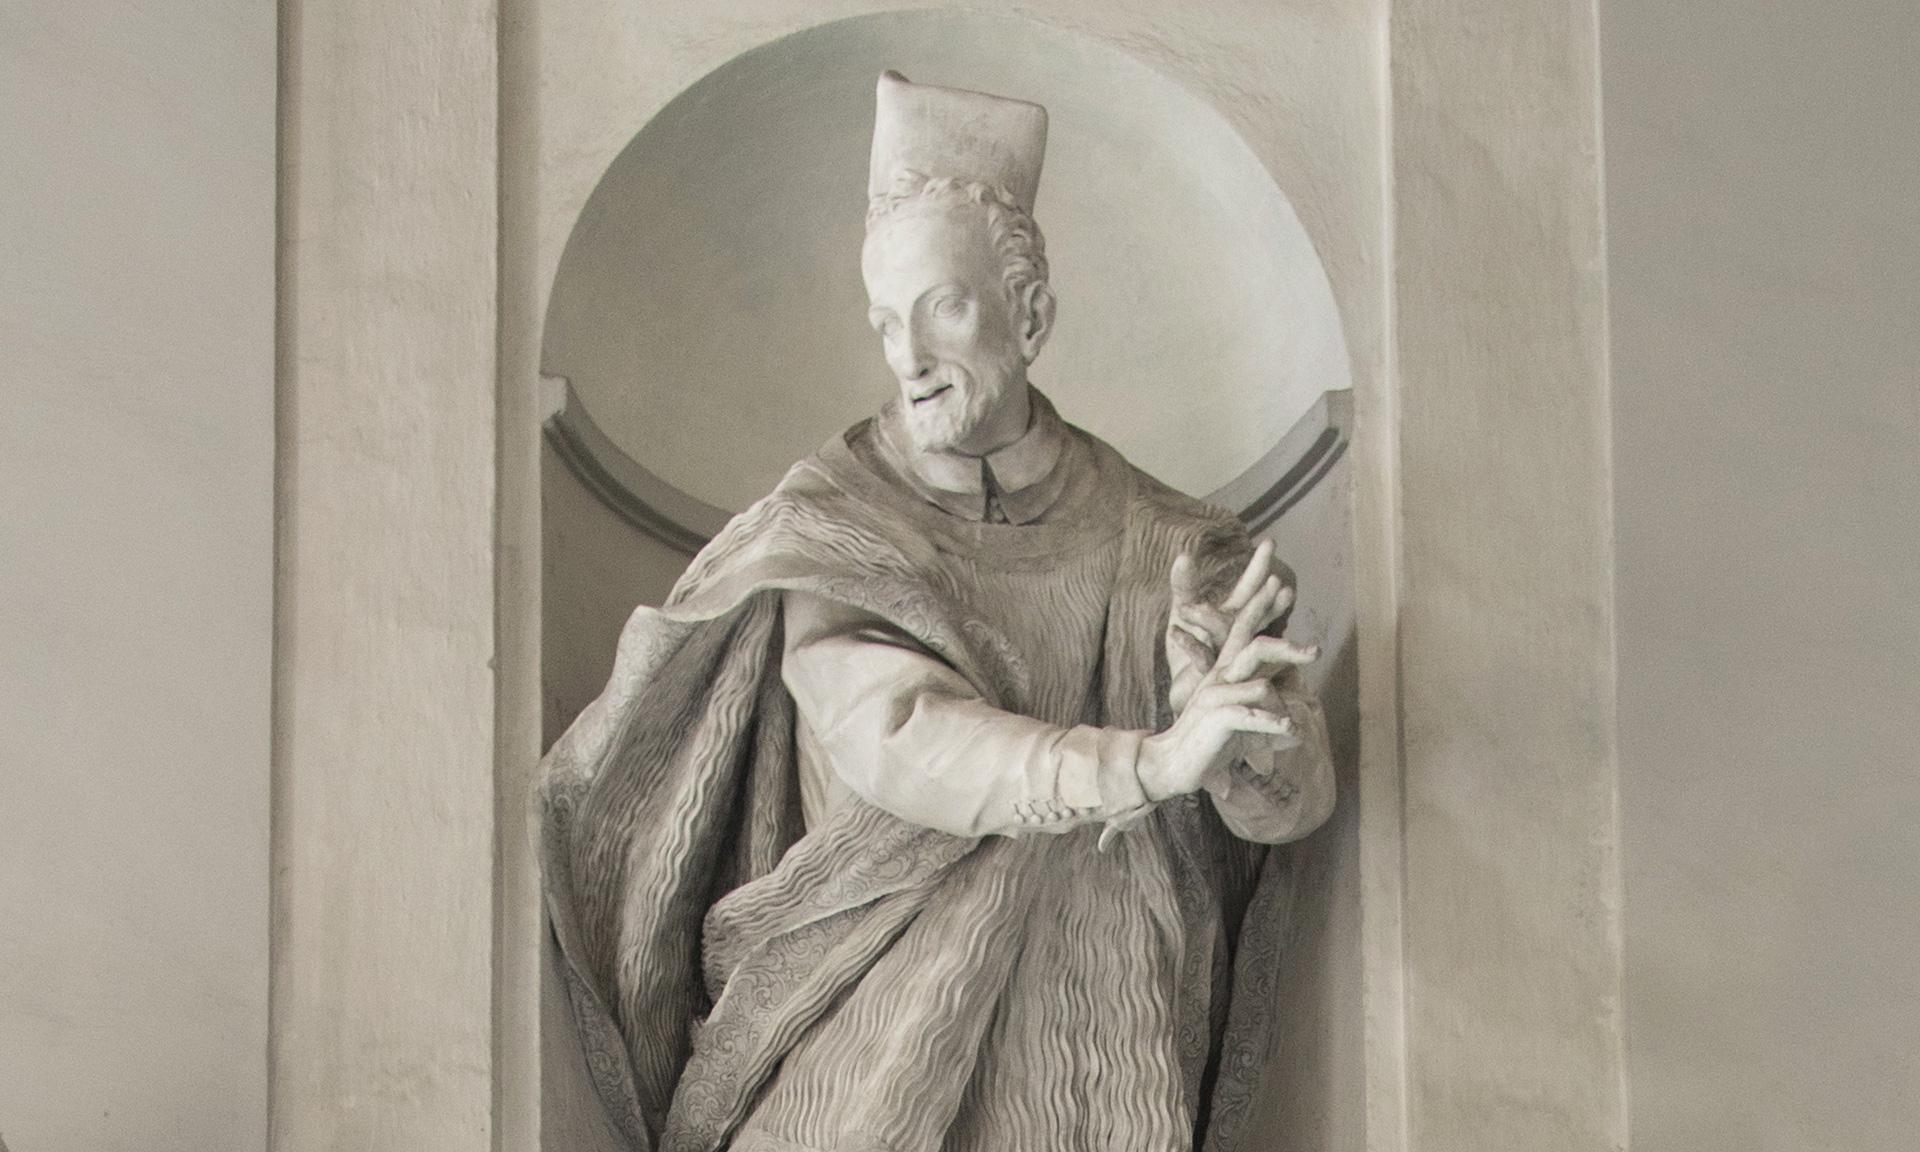 statue_antonio-julio-brignole-sale_01 - Albergo dei Poveri Genova